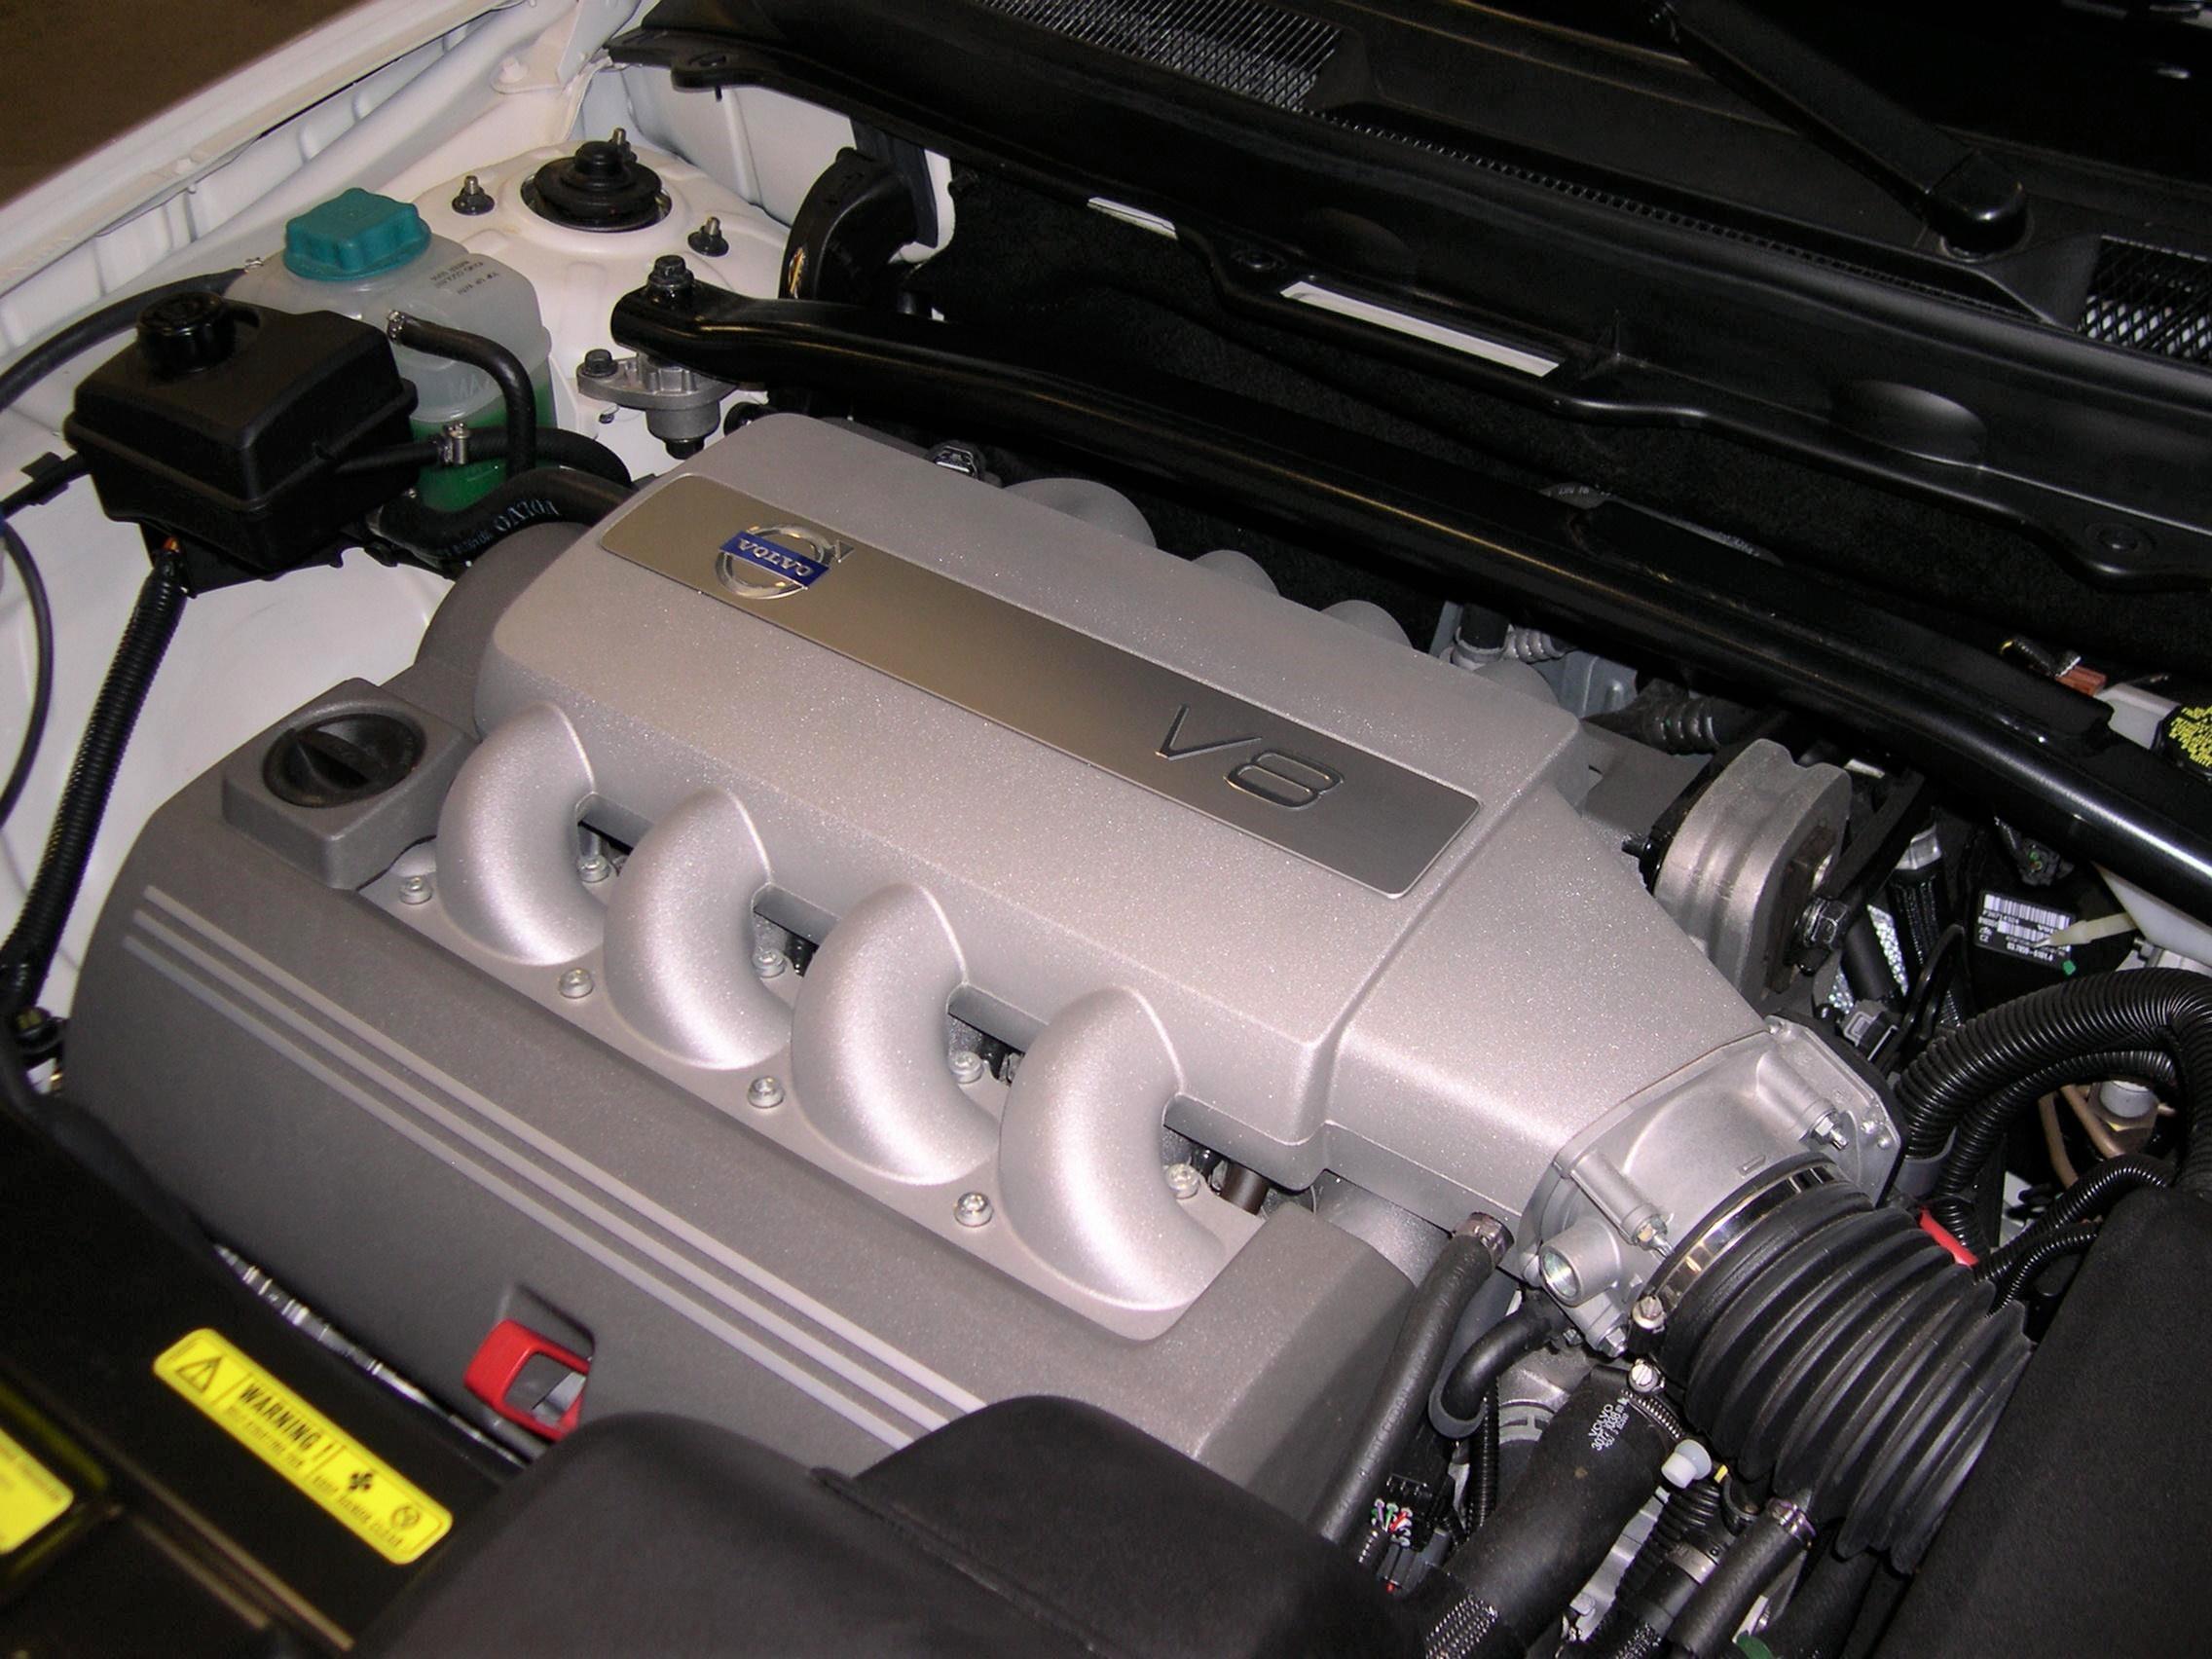 http://upload.wikimedia.org/wikipedia/commons/3/33/2006_Volvo_XC90_V8_engine.jpg